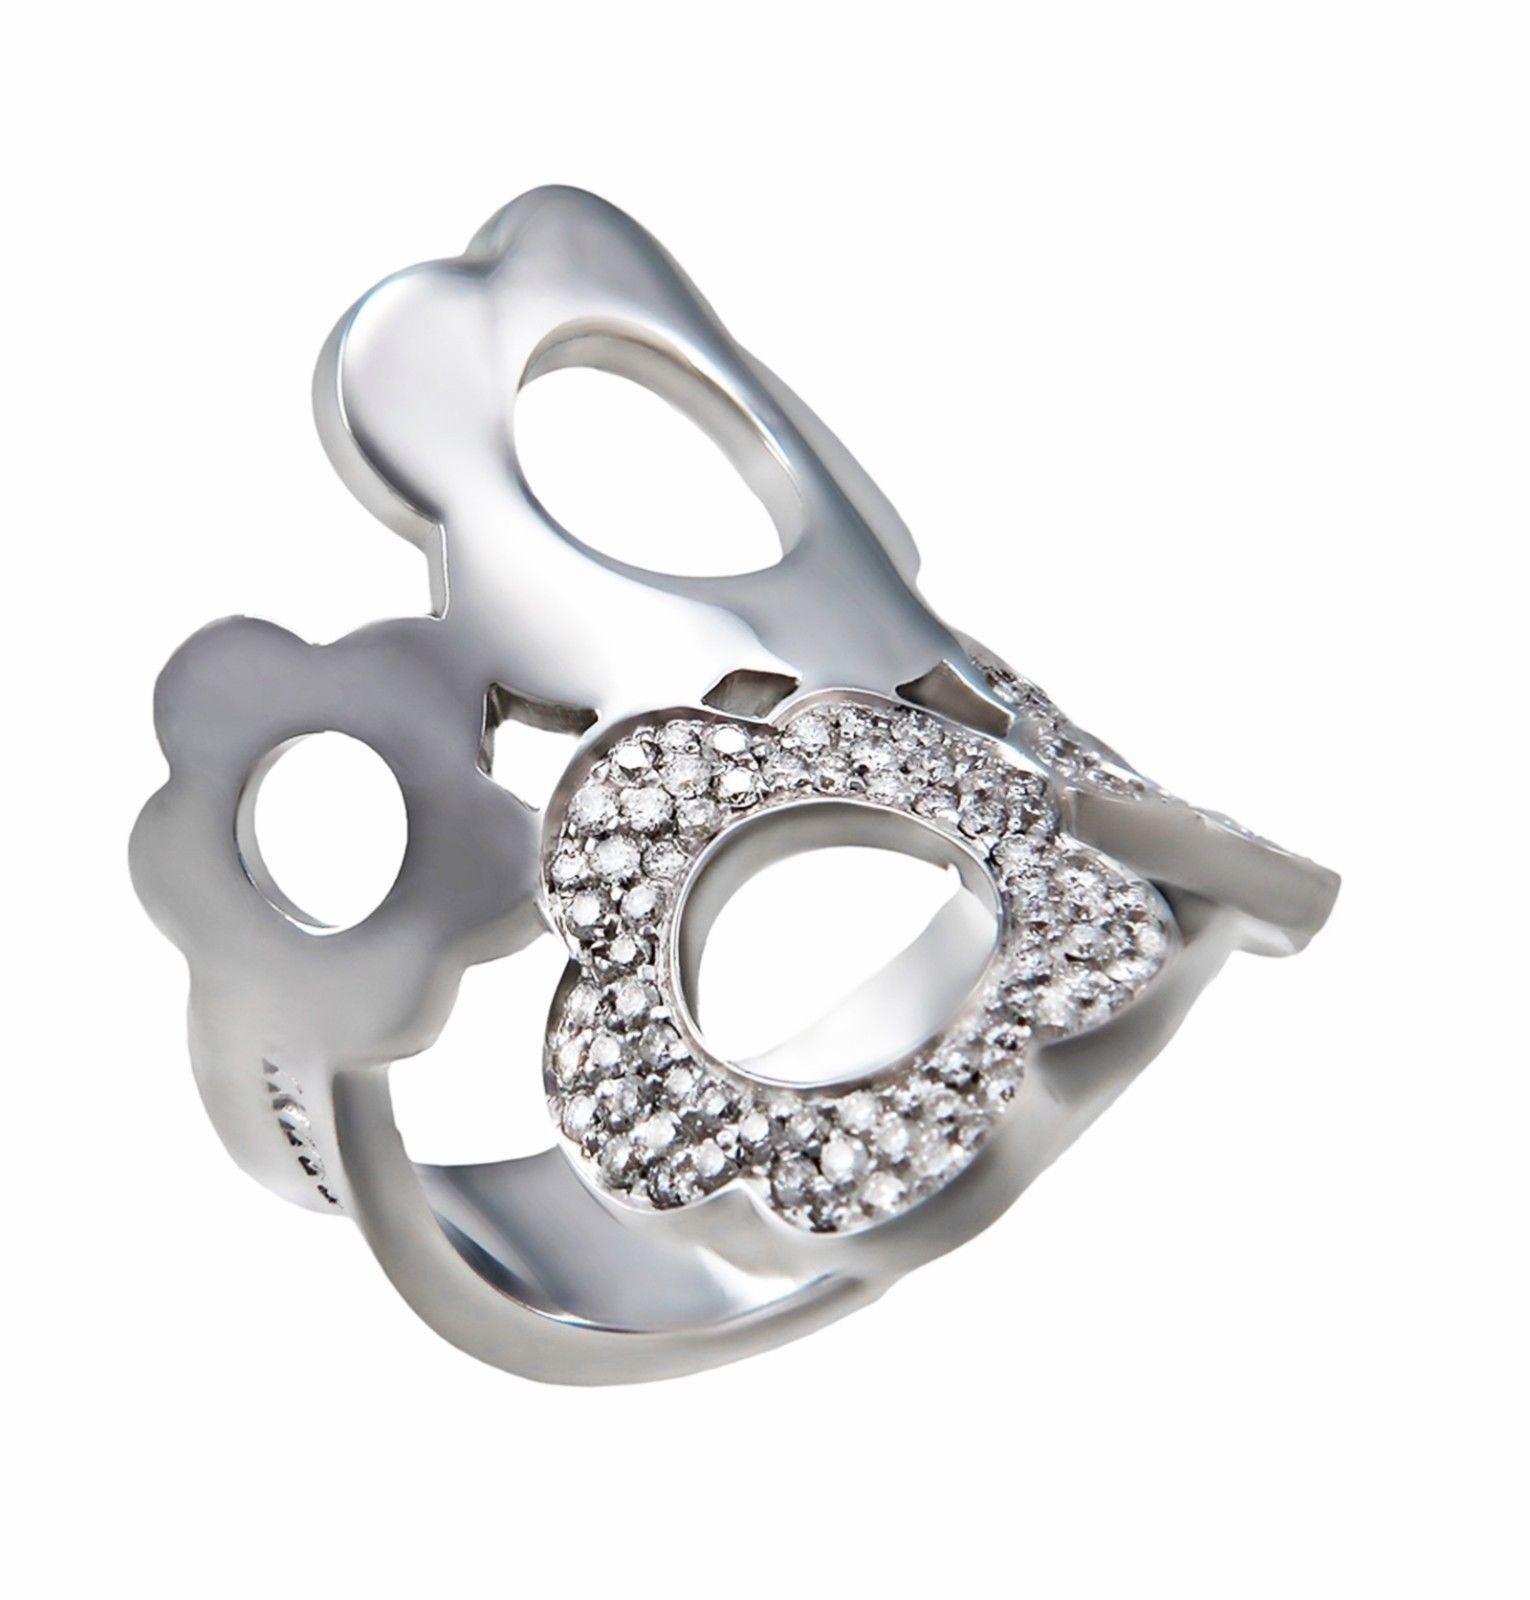 """""Pasquale Bruni Flower Mima 18K White Gold 0.62ct Diamond Ring Size 7"""""" 2327019"